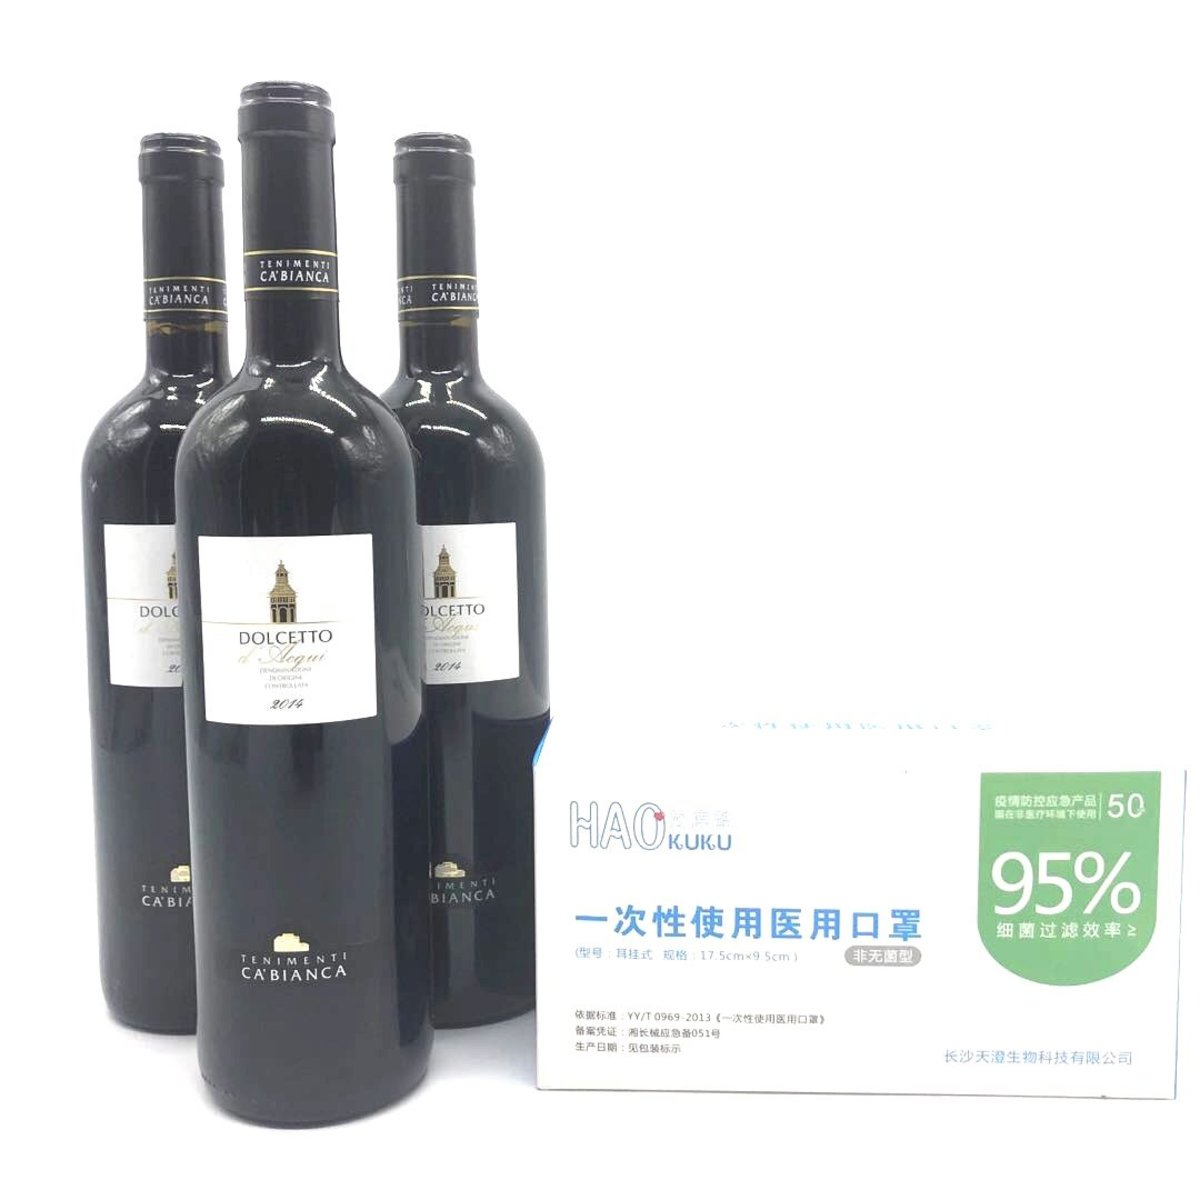 Tenimenti Ca' Bianca Dolcetto d'Acqui, Piedmont, Italy 2014×3瓶(贈送好庫酷-一次性防護口罩一盒50個)